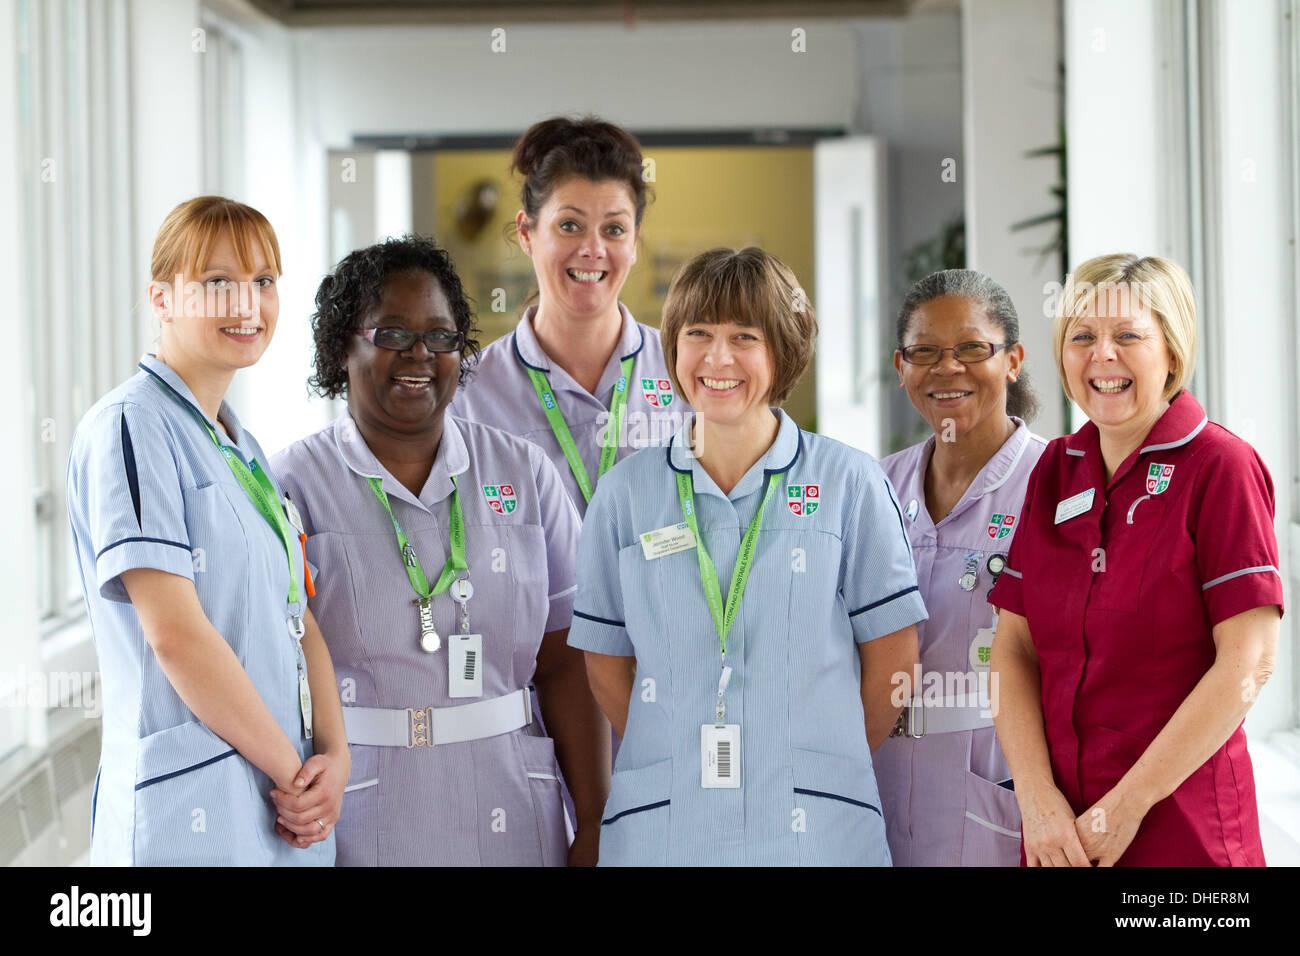 A group of 5 nurses smile toward the camera in a hospital corridor UK - Stock Image